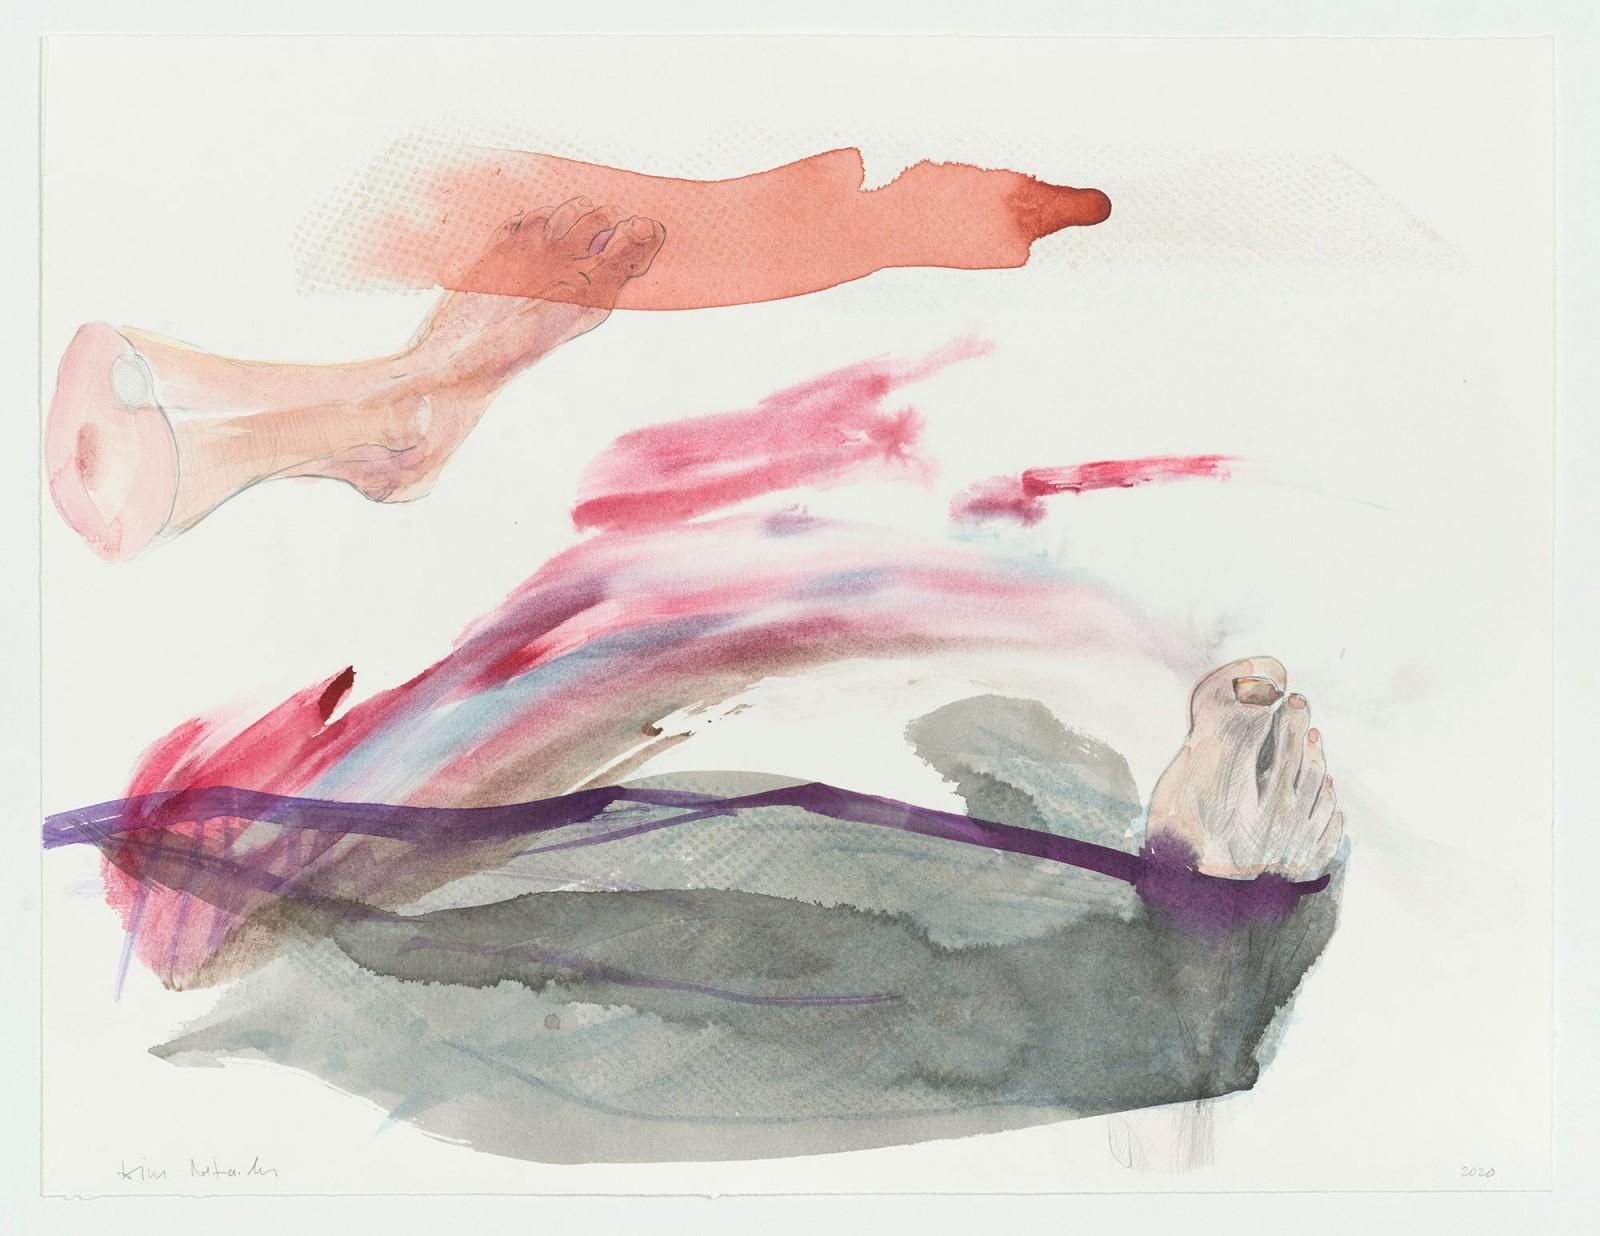 Kim Nekarda: untitled, 2020, watercolour, pencil & ink on paper, 42 x 54 cm